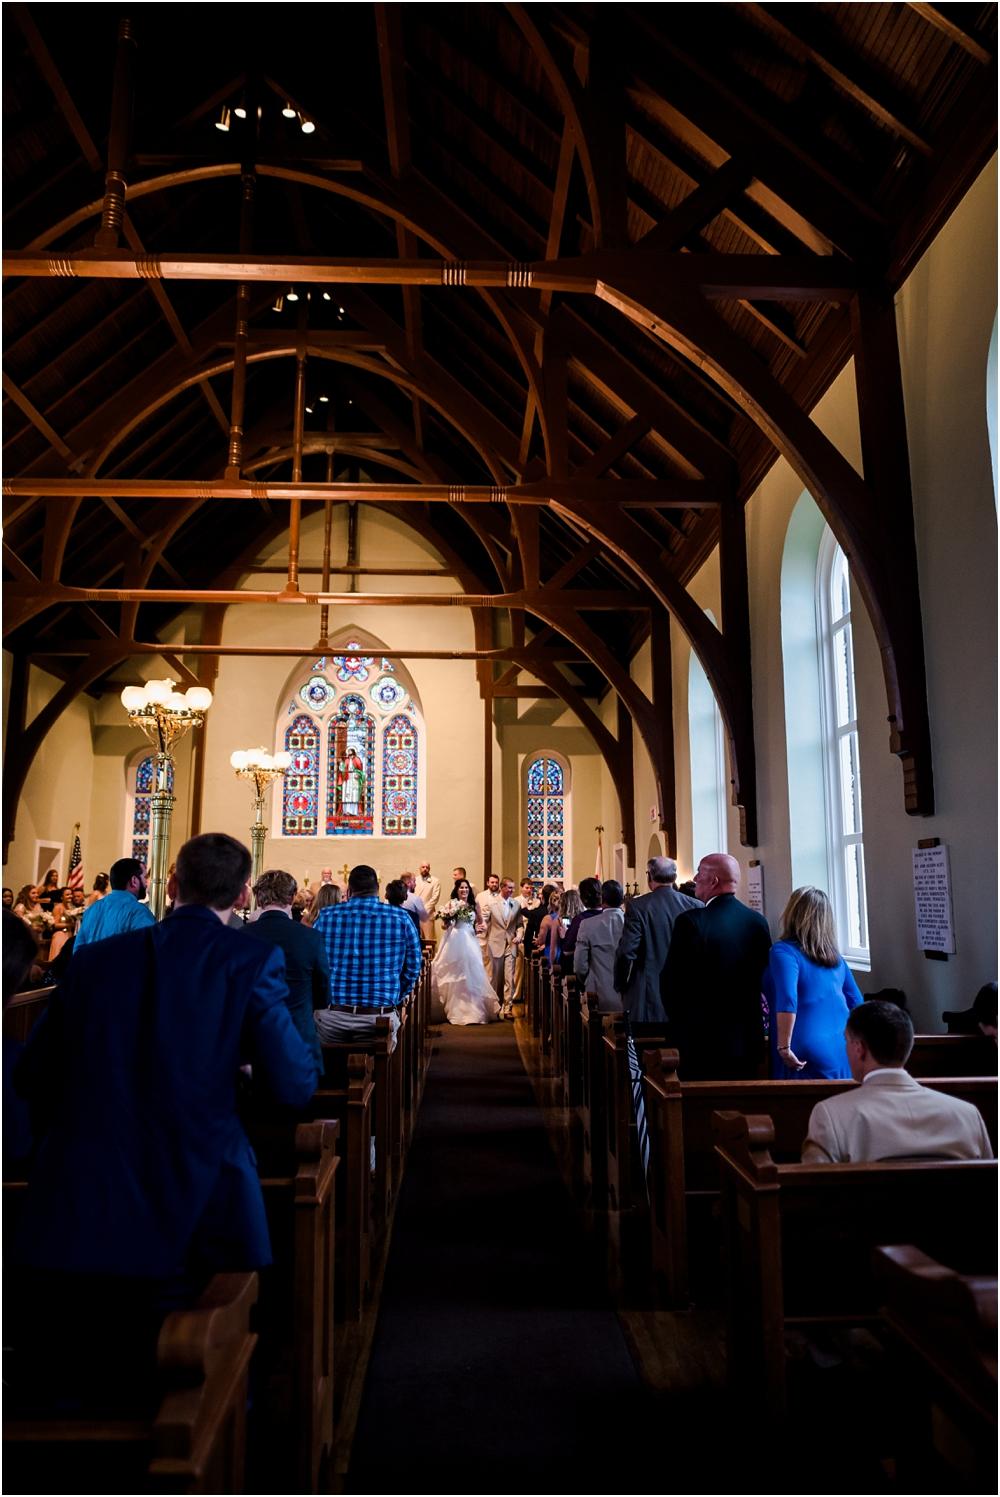 pensacola-wedding-photographer-kiersten-grant-99.jpg